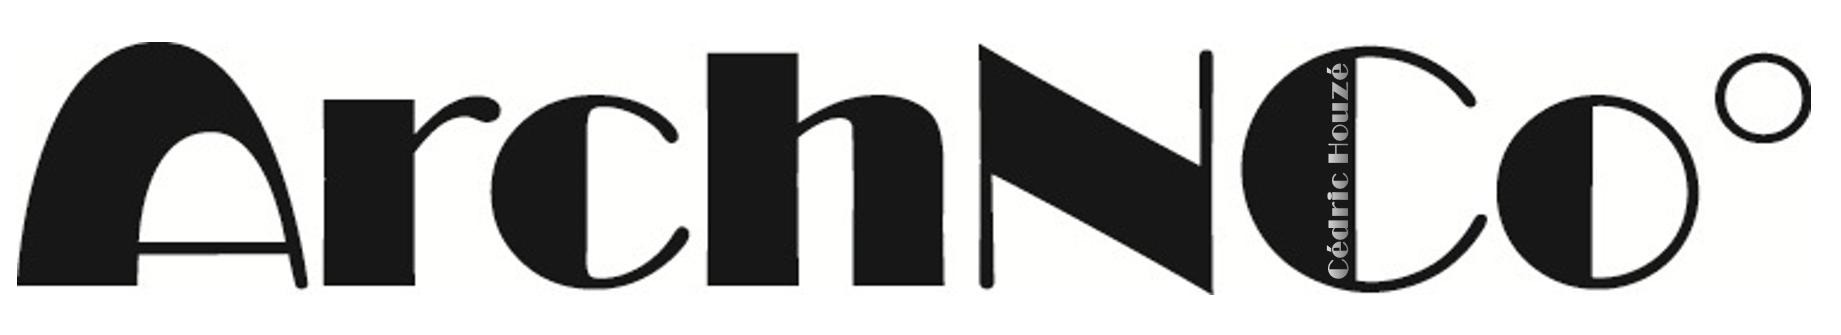 Logo_ARCHNCO_Cédric-Houzé_2.png